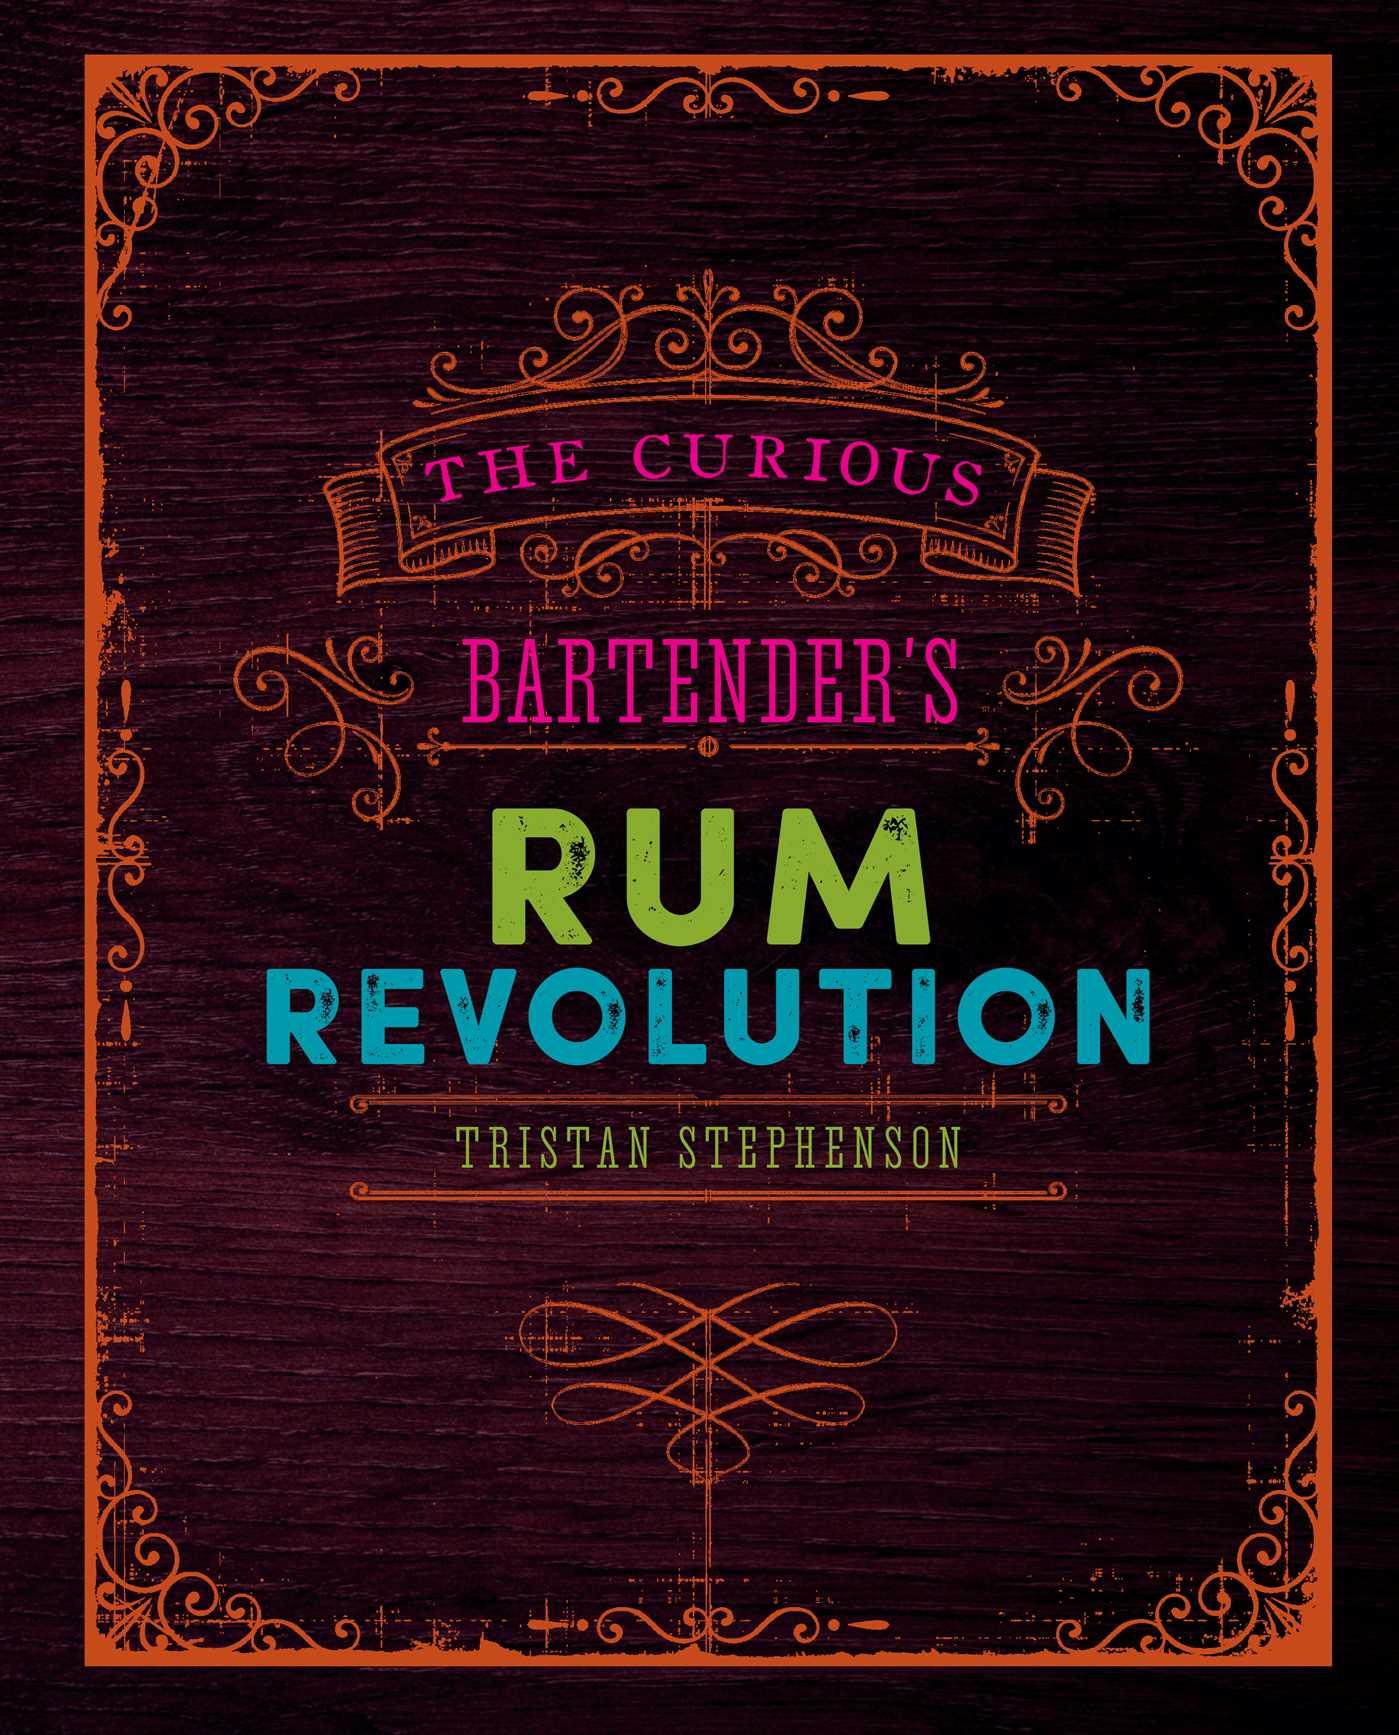 The curious bartenders rum revolution 9781849758239 hr